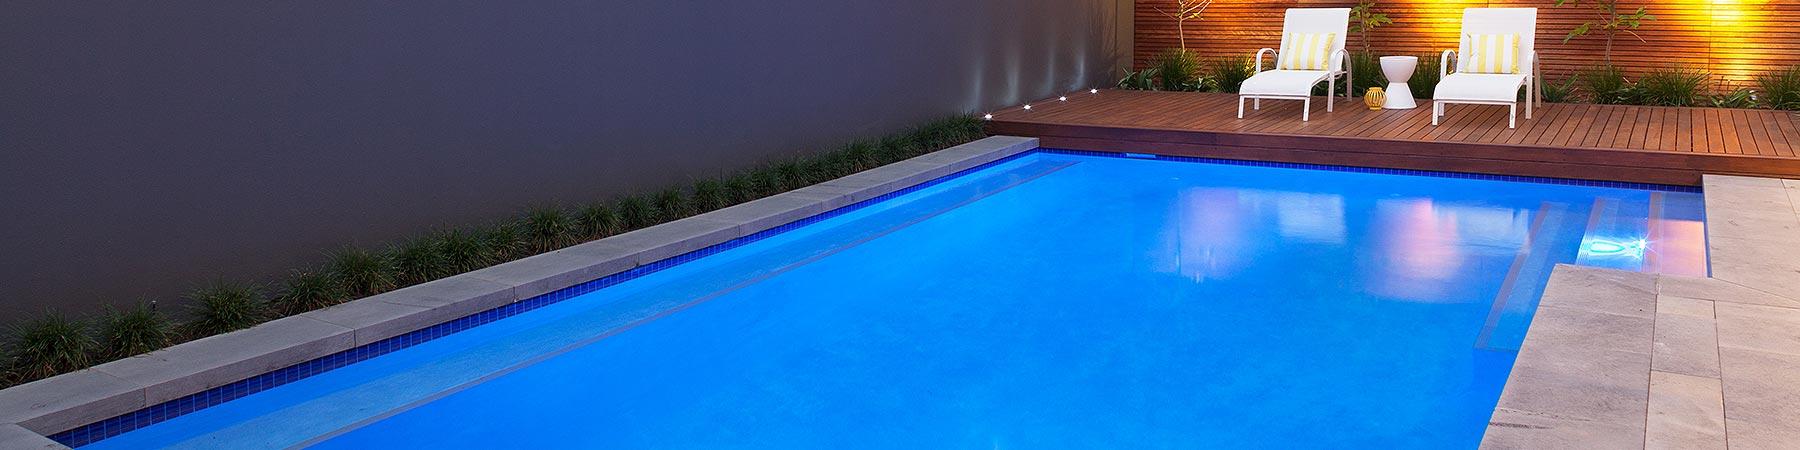 Swimming-Pool-Interior-Hawaii-Blue